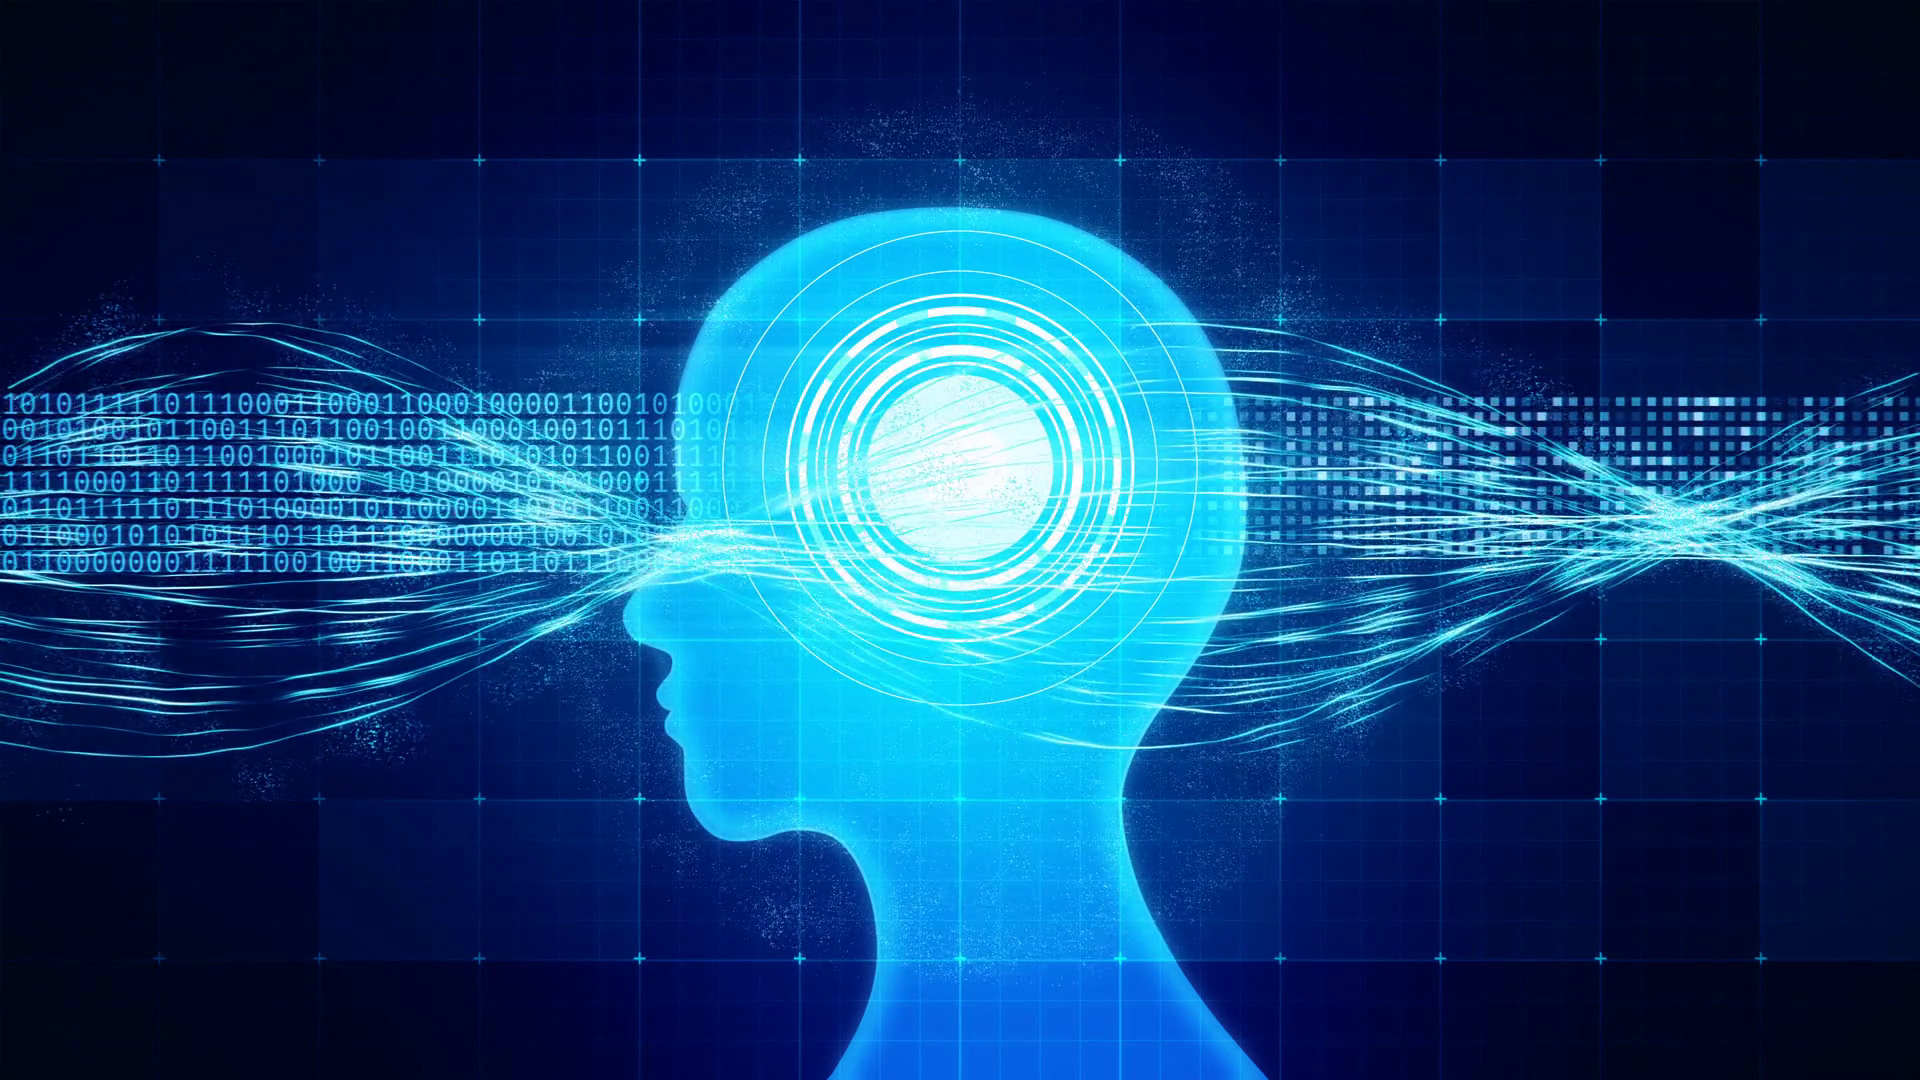 Neuroscience Wallpaper Hd Wallpaper Orange Wallpaper Neuroscience